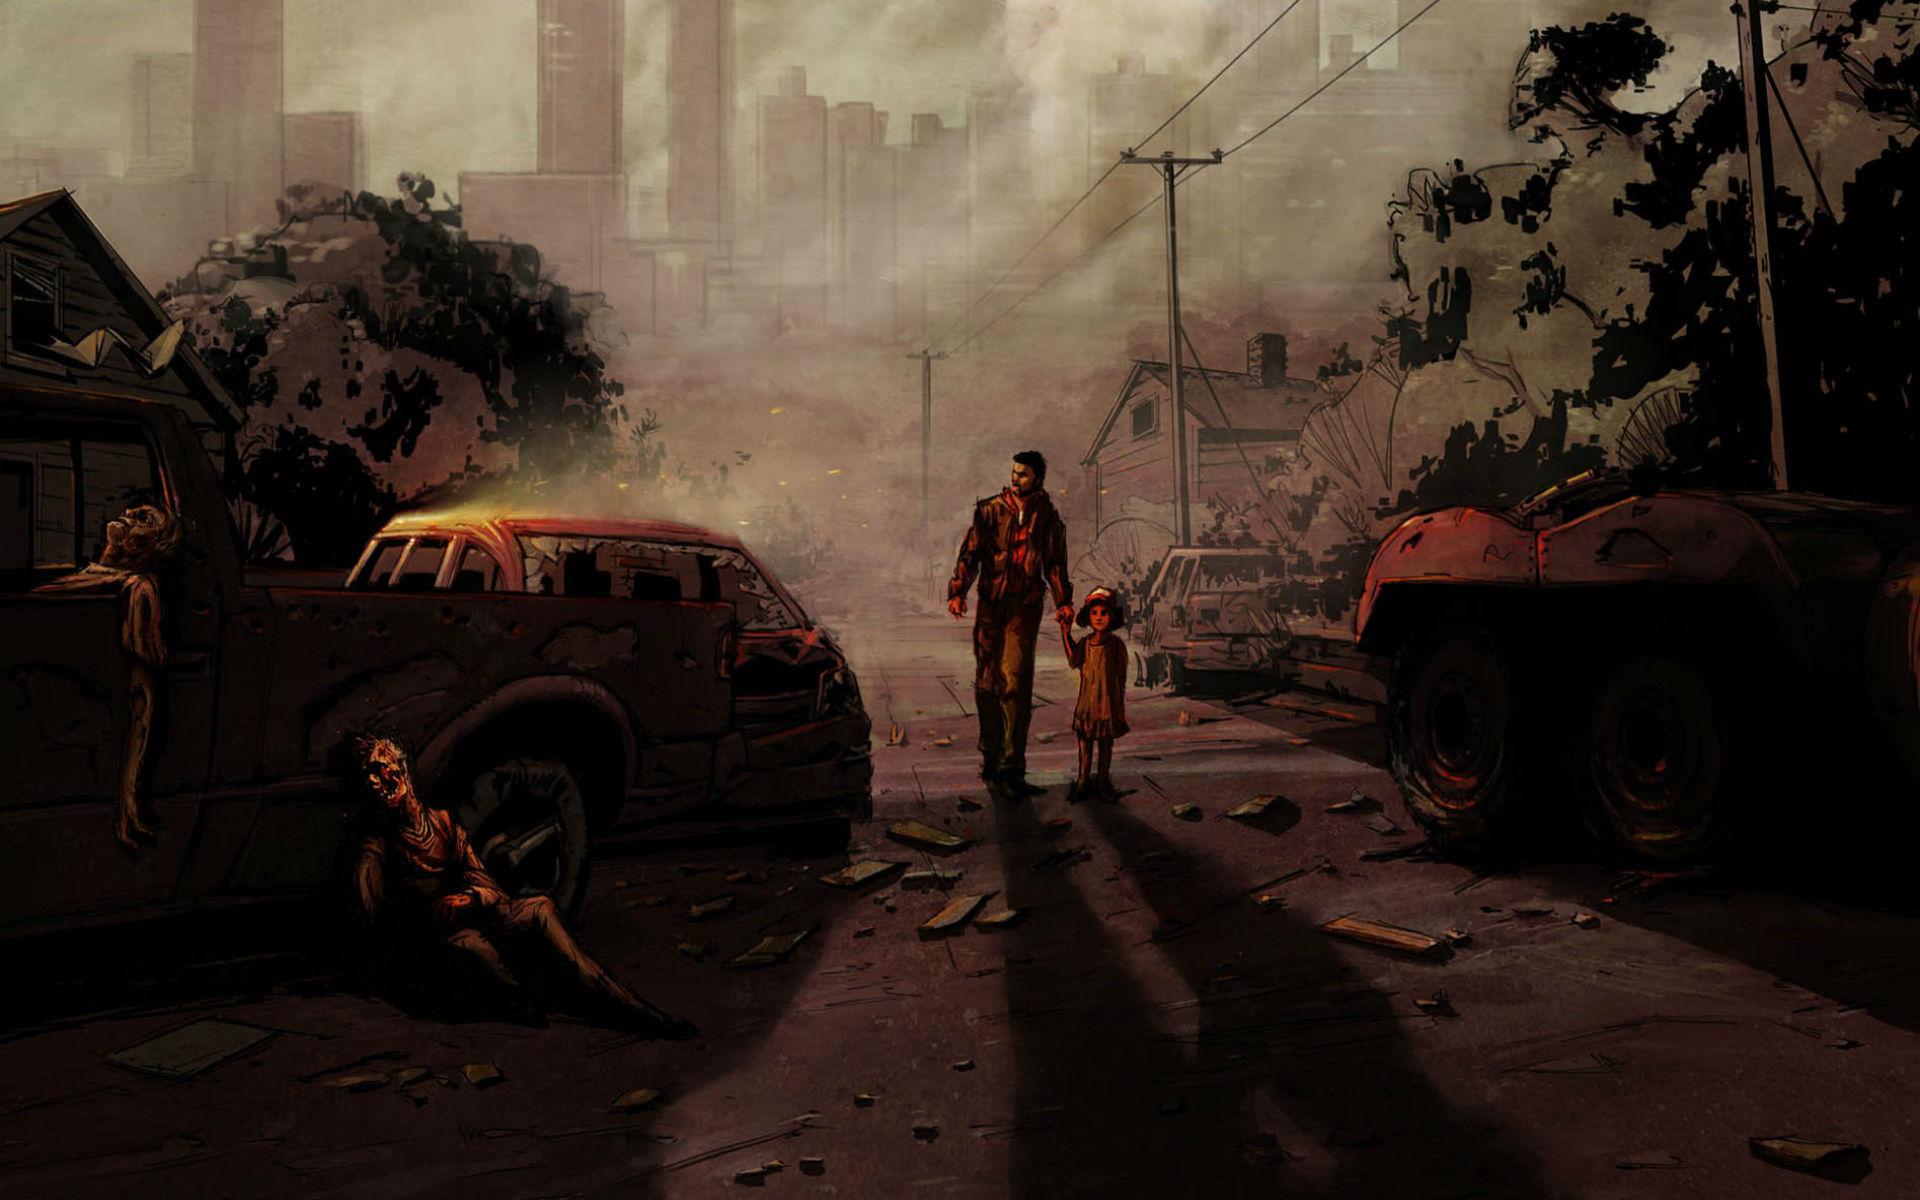 The Walking Dead Full Hd Fondo De Pantalla And Fondo De: The Walking Dead: Season 1 Full HD Fondo De Pantalla And